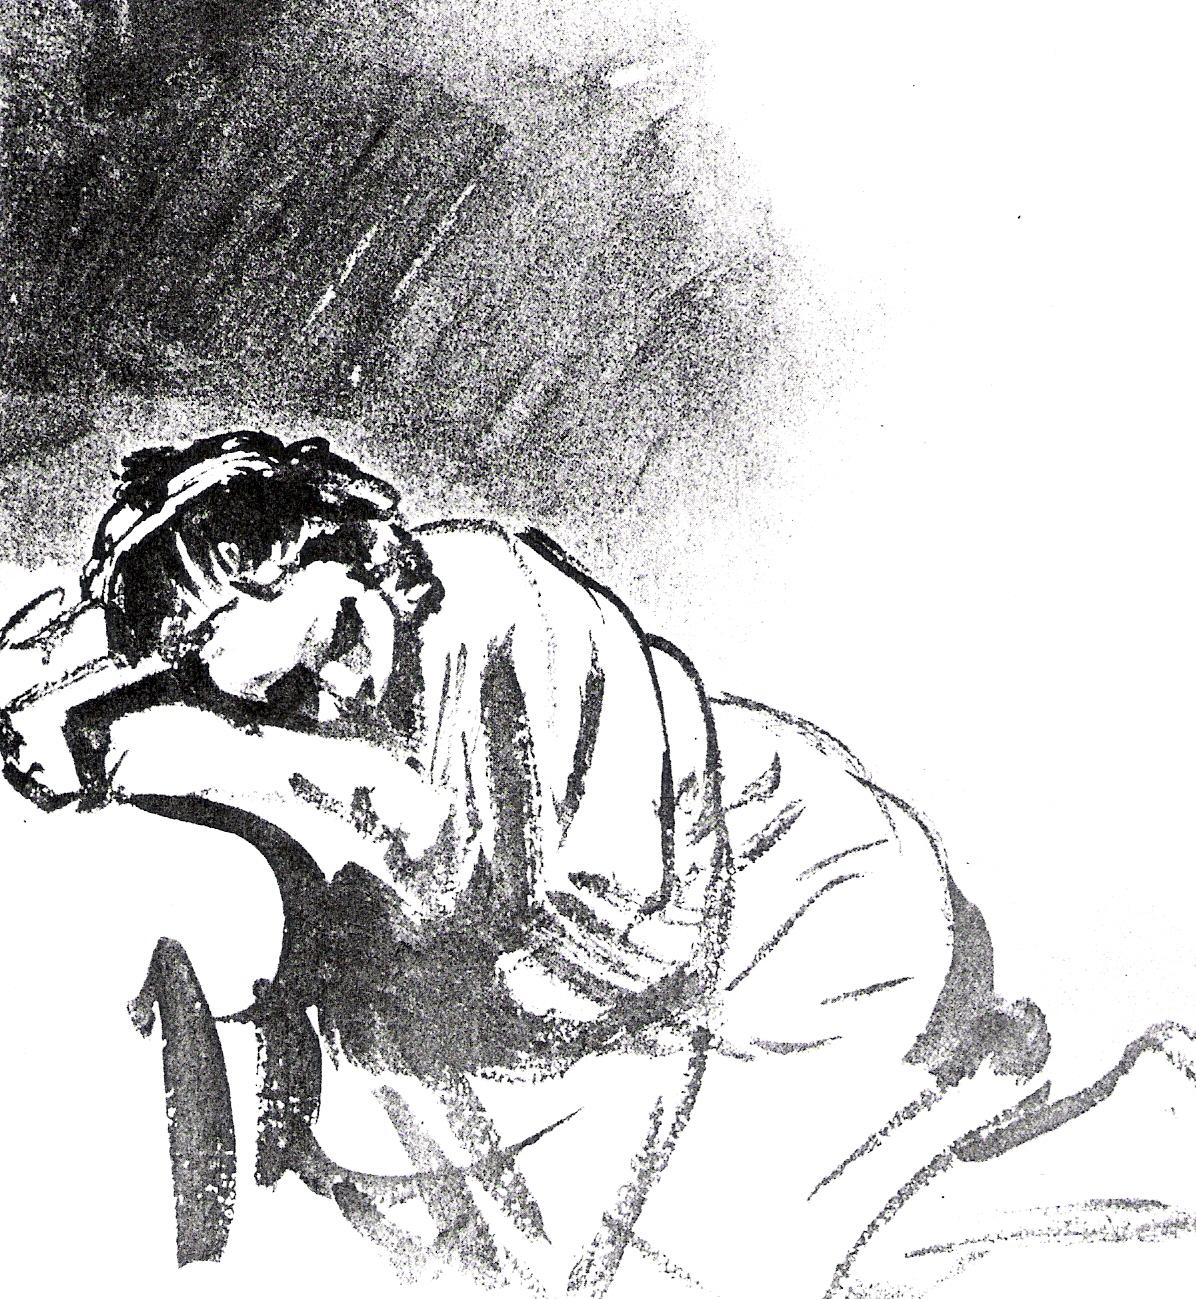 1196x1299 Rembrandt Genius Ignored [Lifeiography]